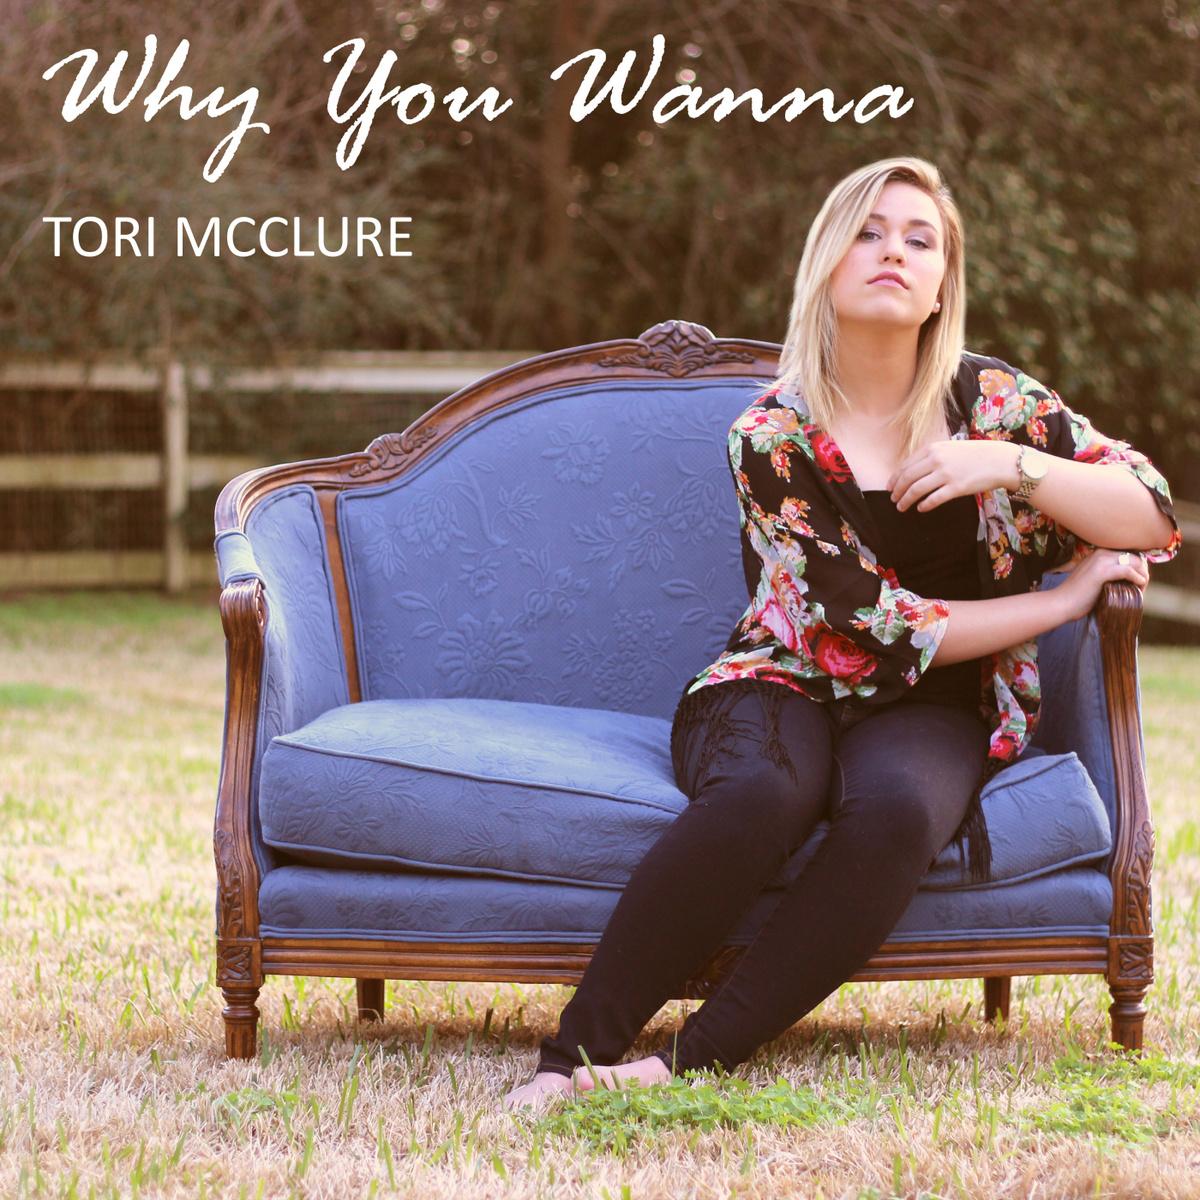 Why You Wanna - Single (2014)